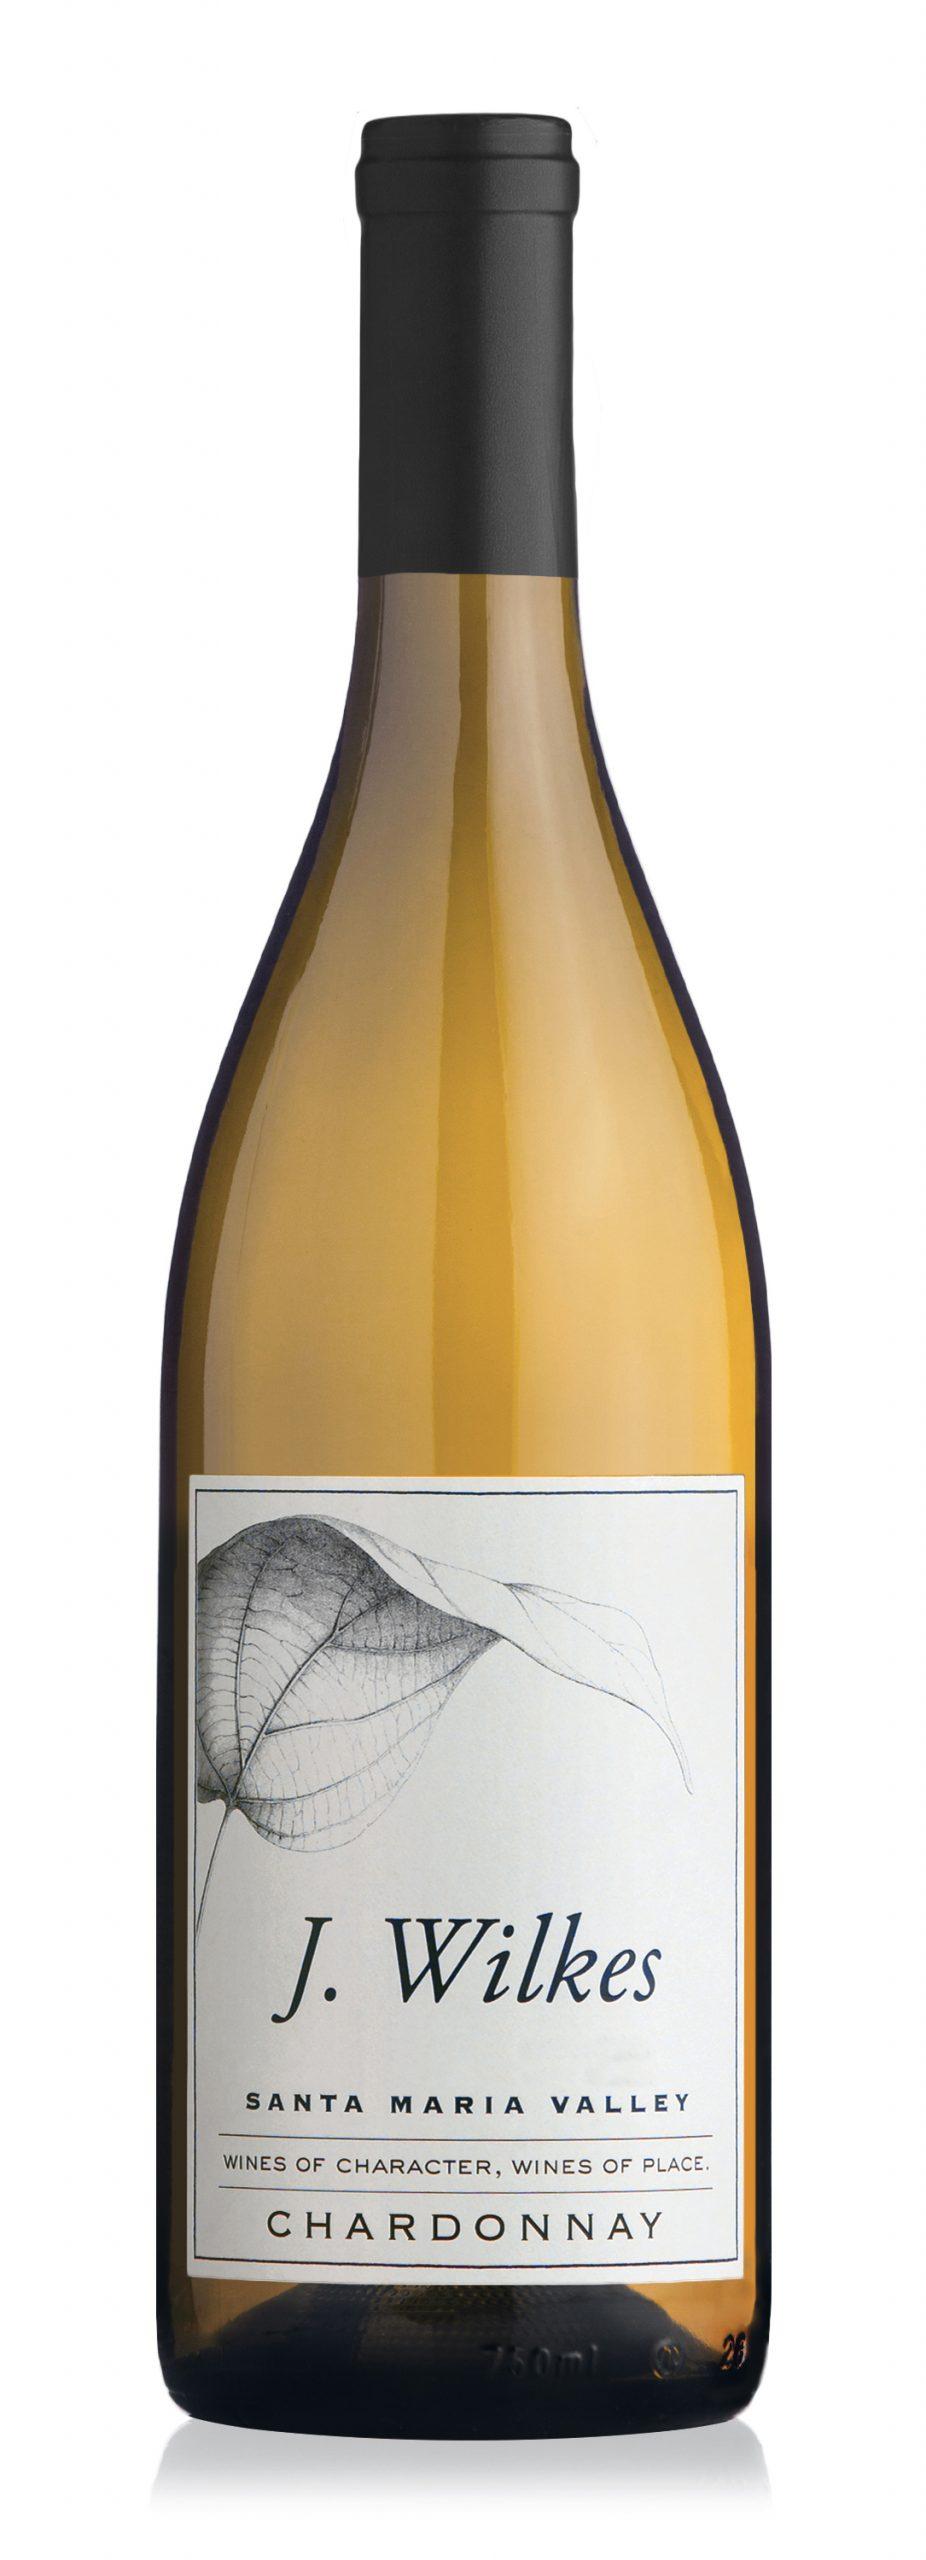 J.Wilkes.Chardonnay.SMV.No.Vintage._NO.AVA.DATE.300dpi